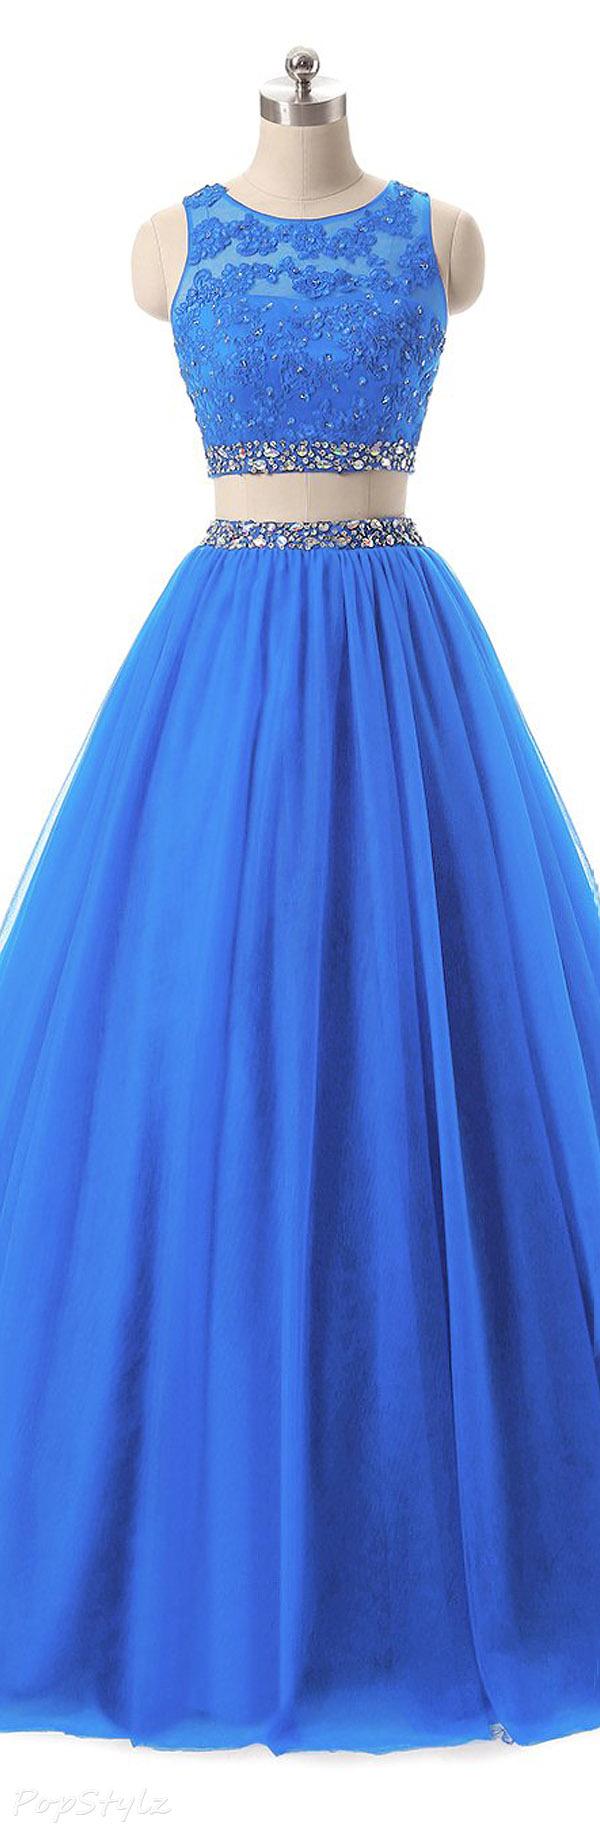 Himoda 2 Piece Beads & Lace Applique Evening Dress